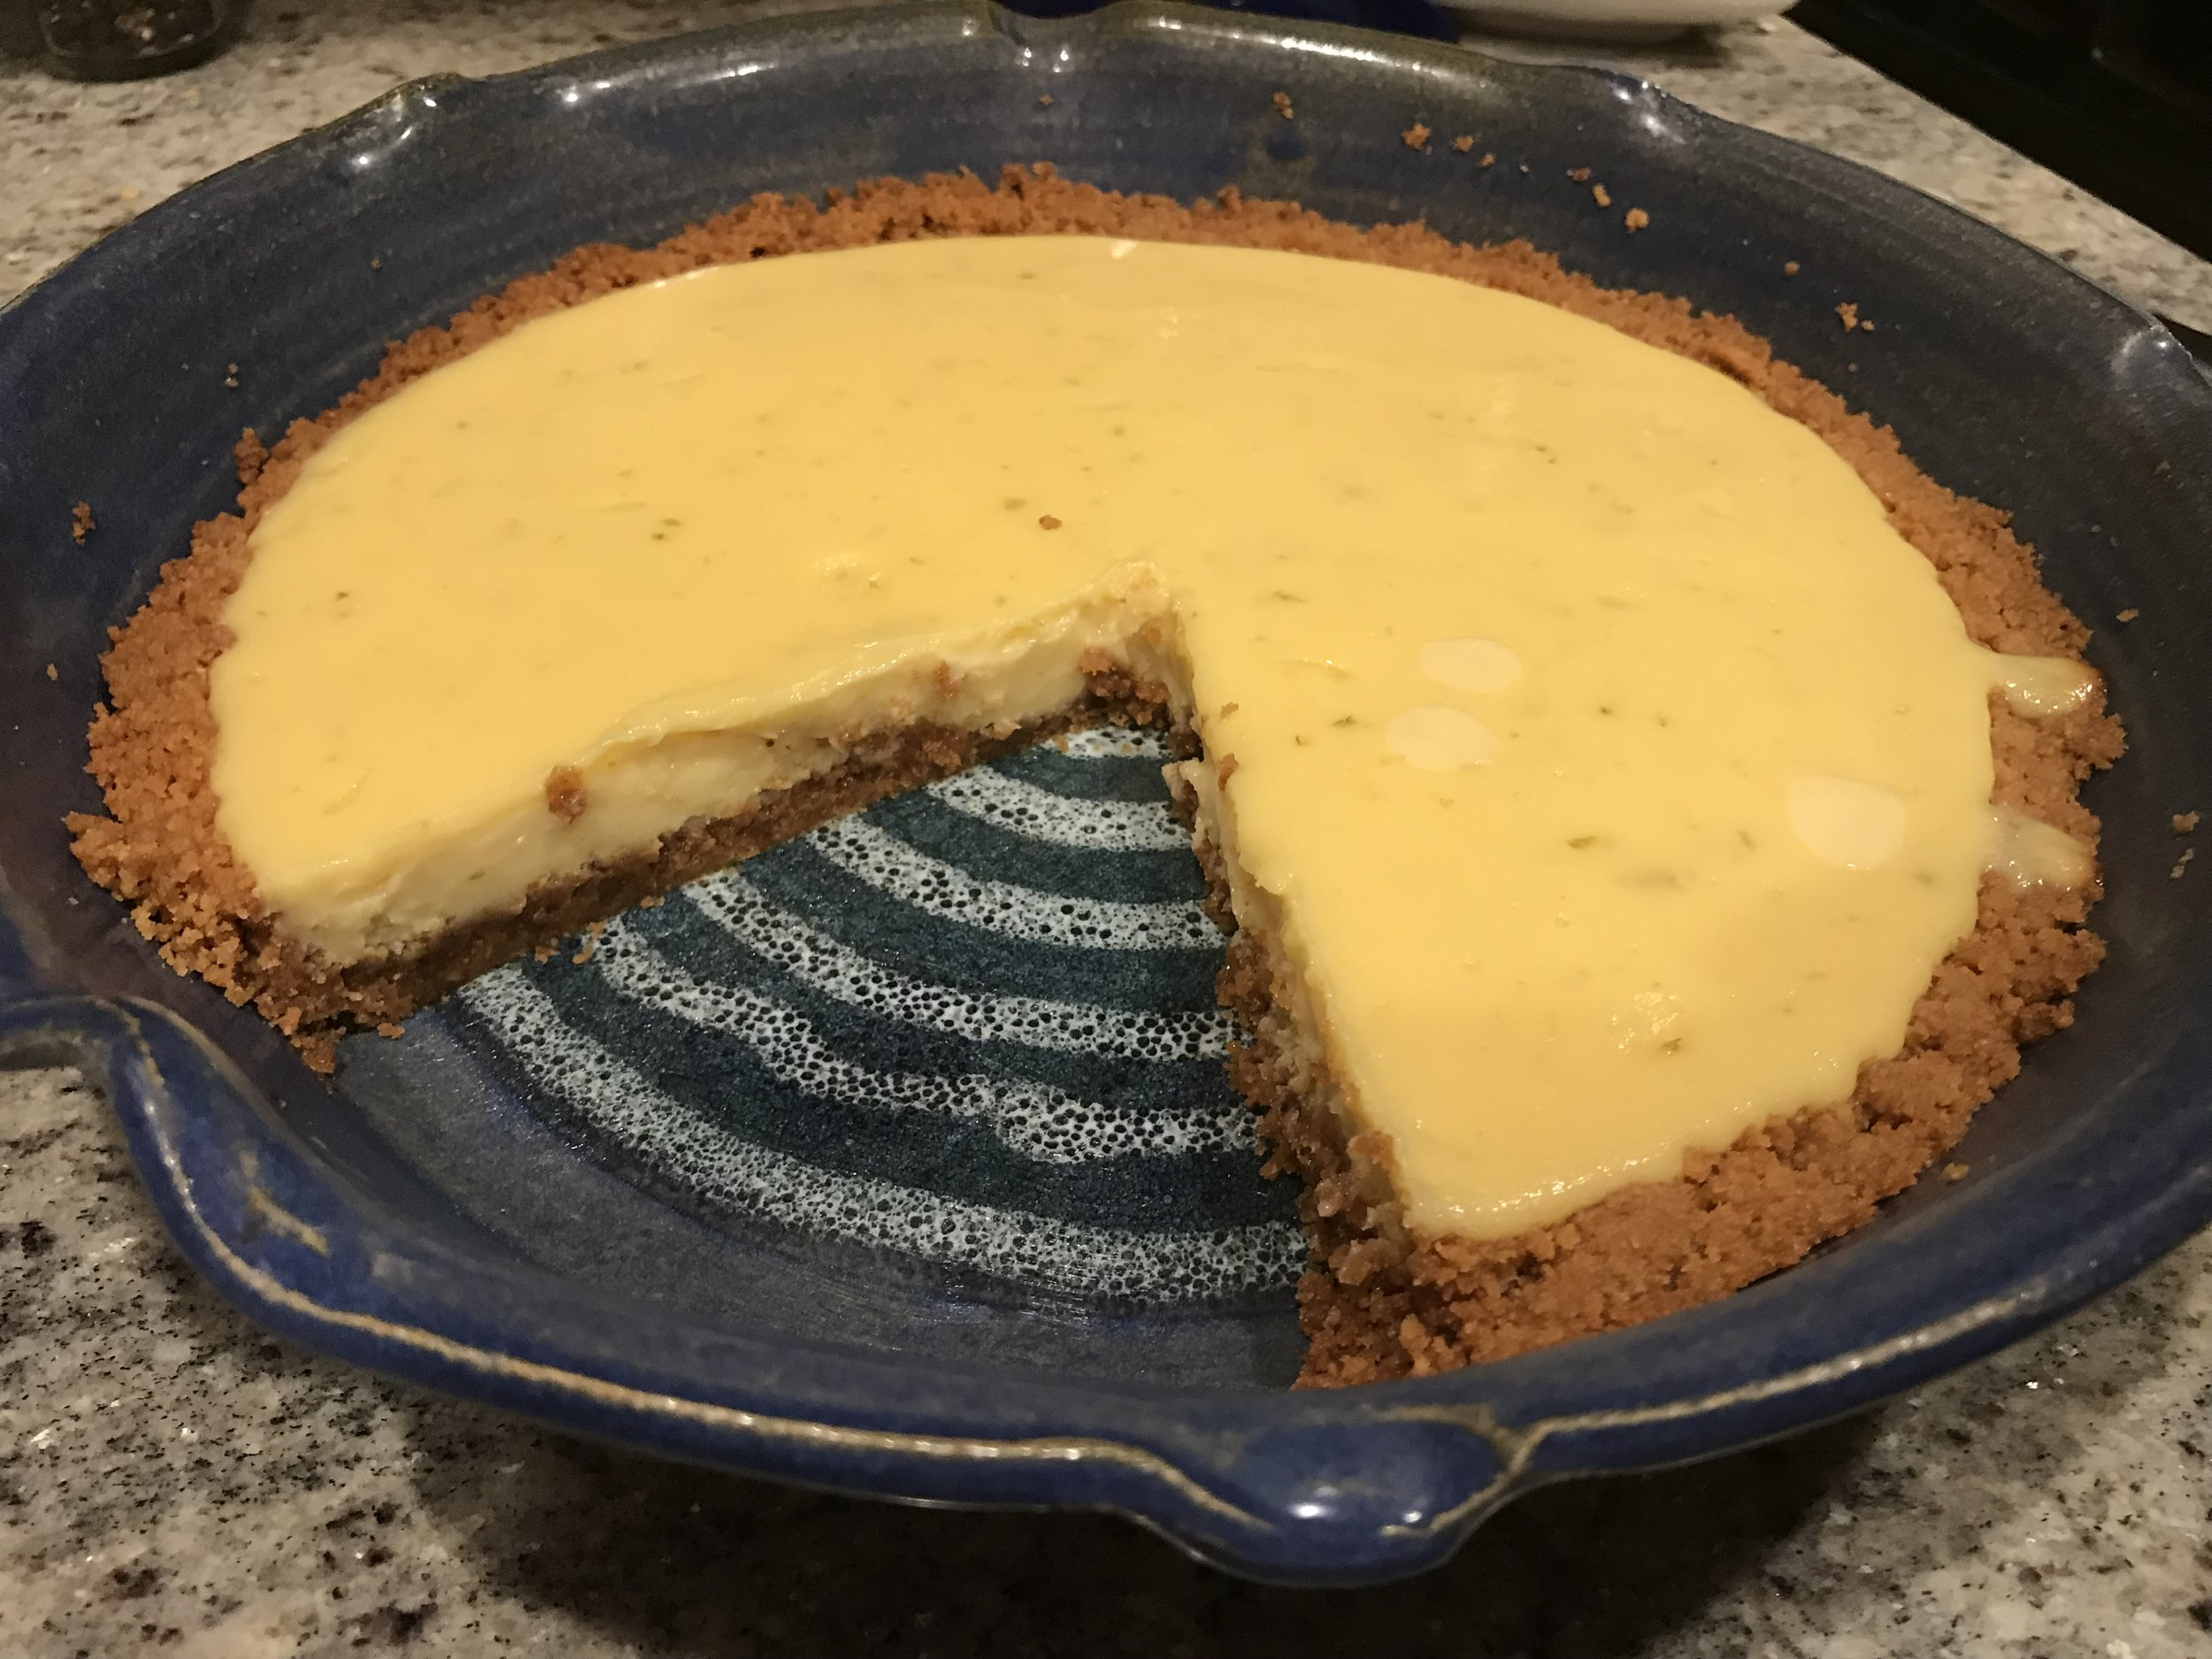 Key lime pie - https://smittenkitchen.com/2015/01/key-lime-pie/